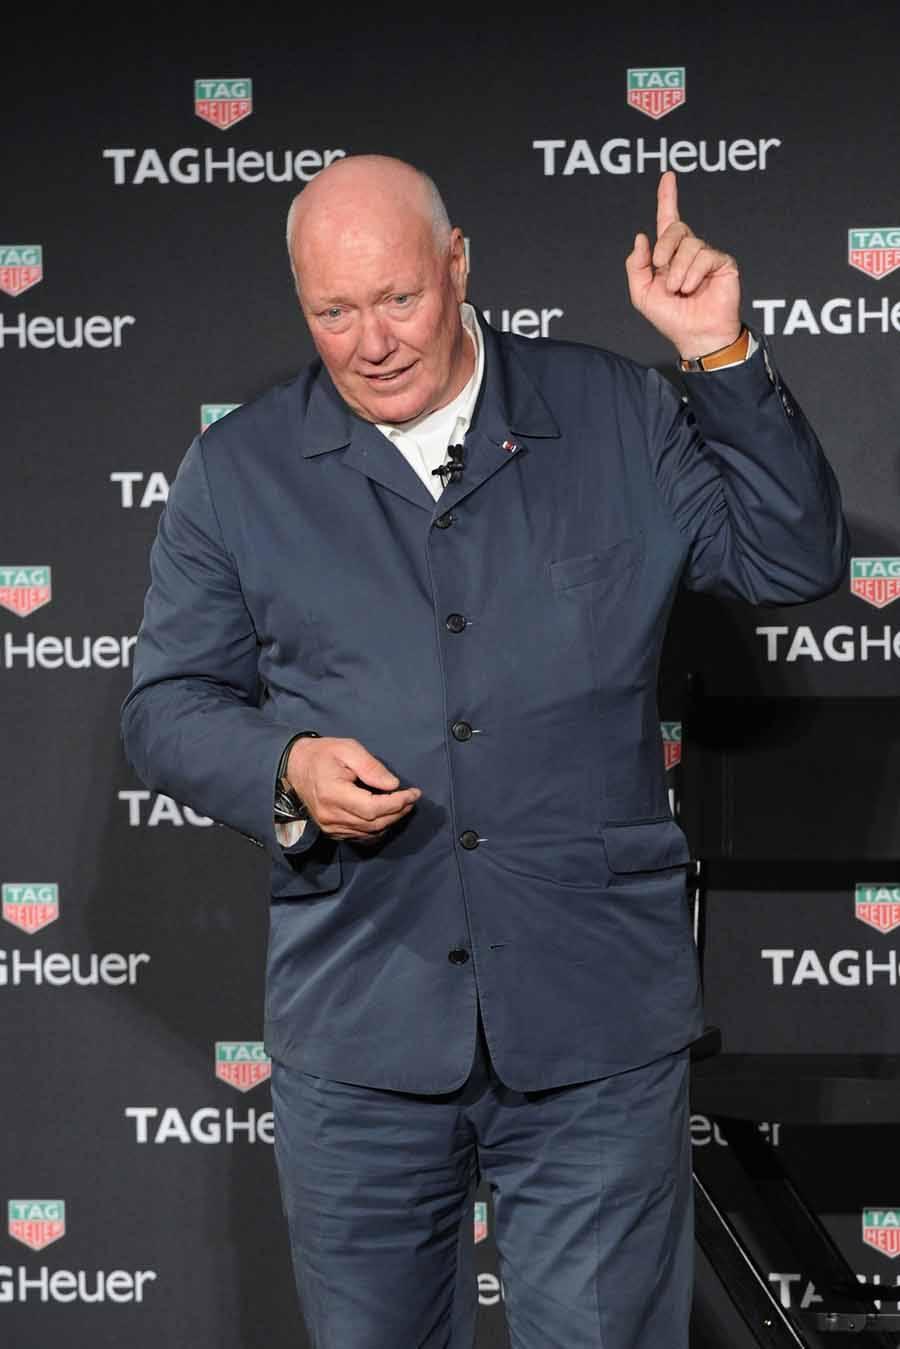 TAG Heuer: CEO Jean-Claude Biver